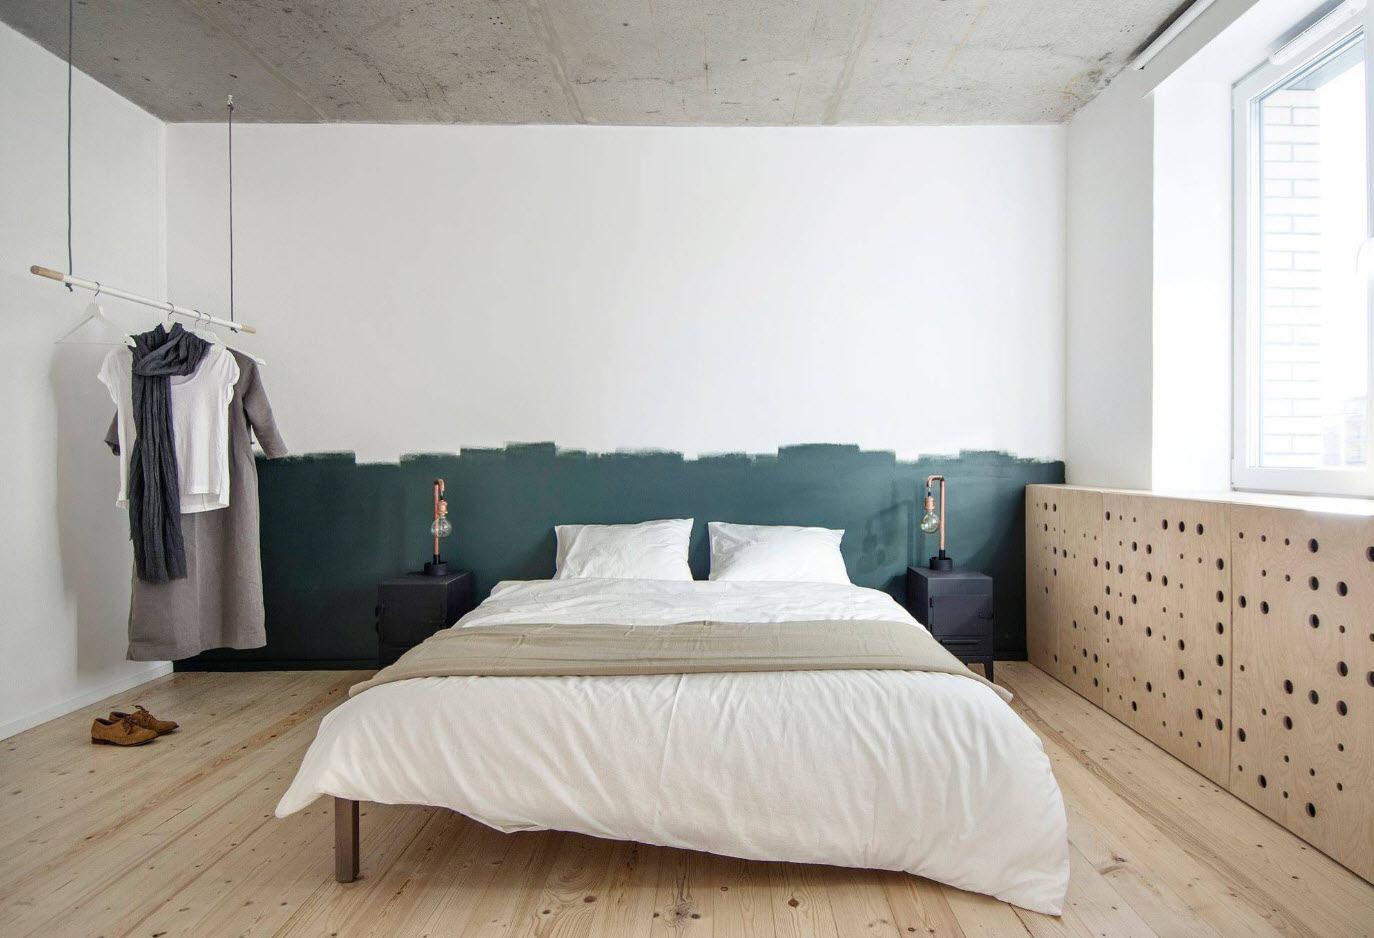 120 Square Feet Bedroom Interior Decoration Ideas. Minimalistic bedroom setting